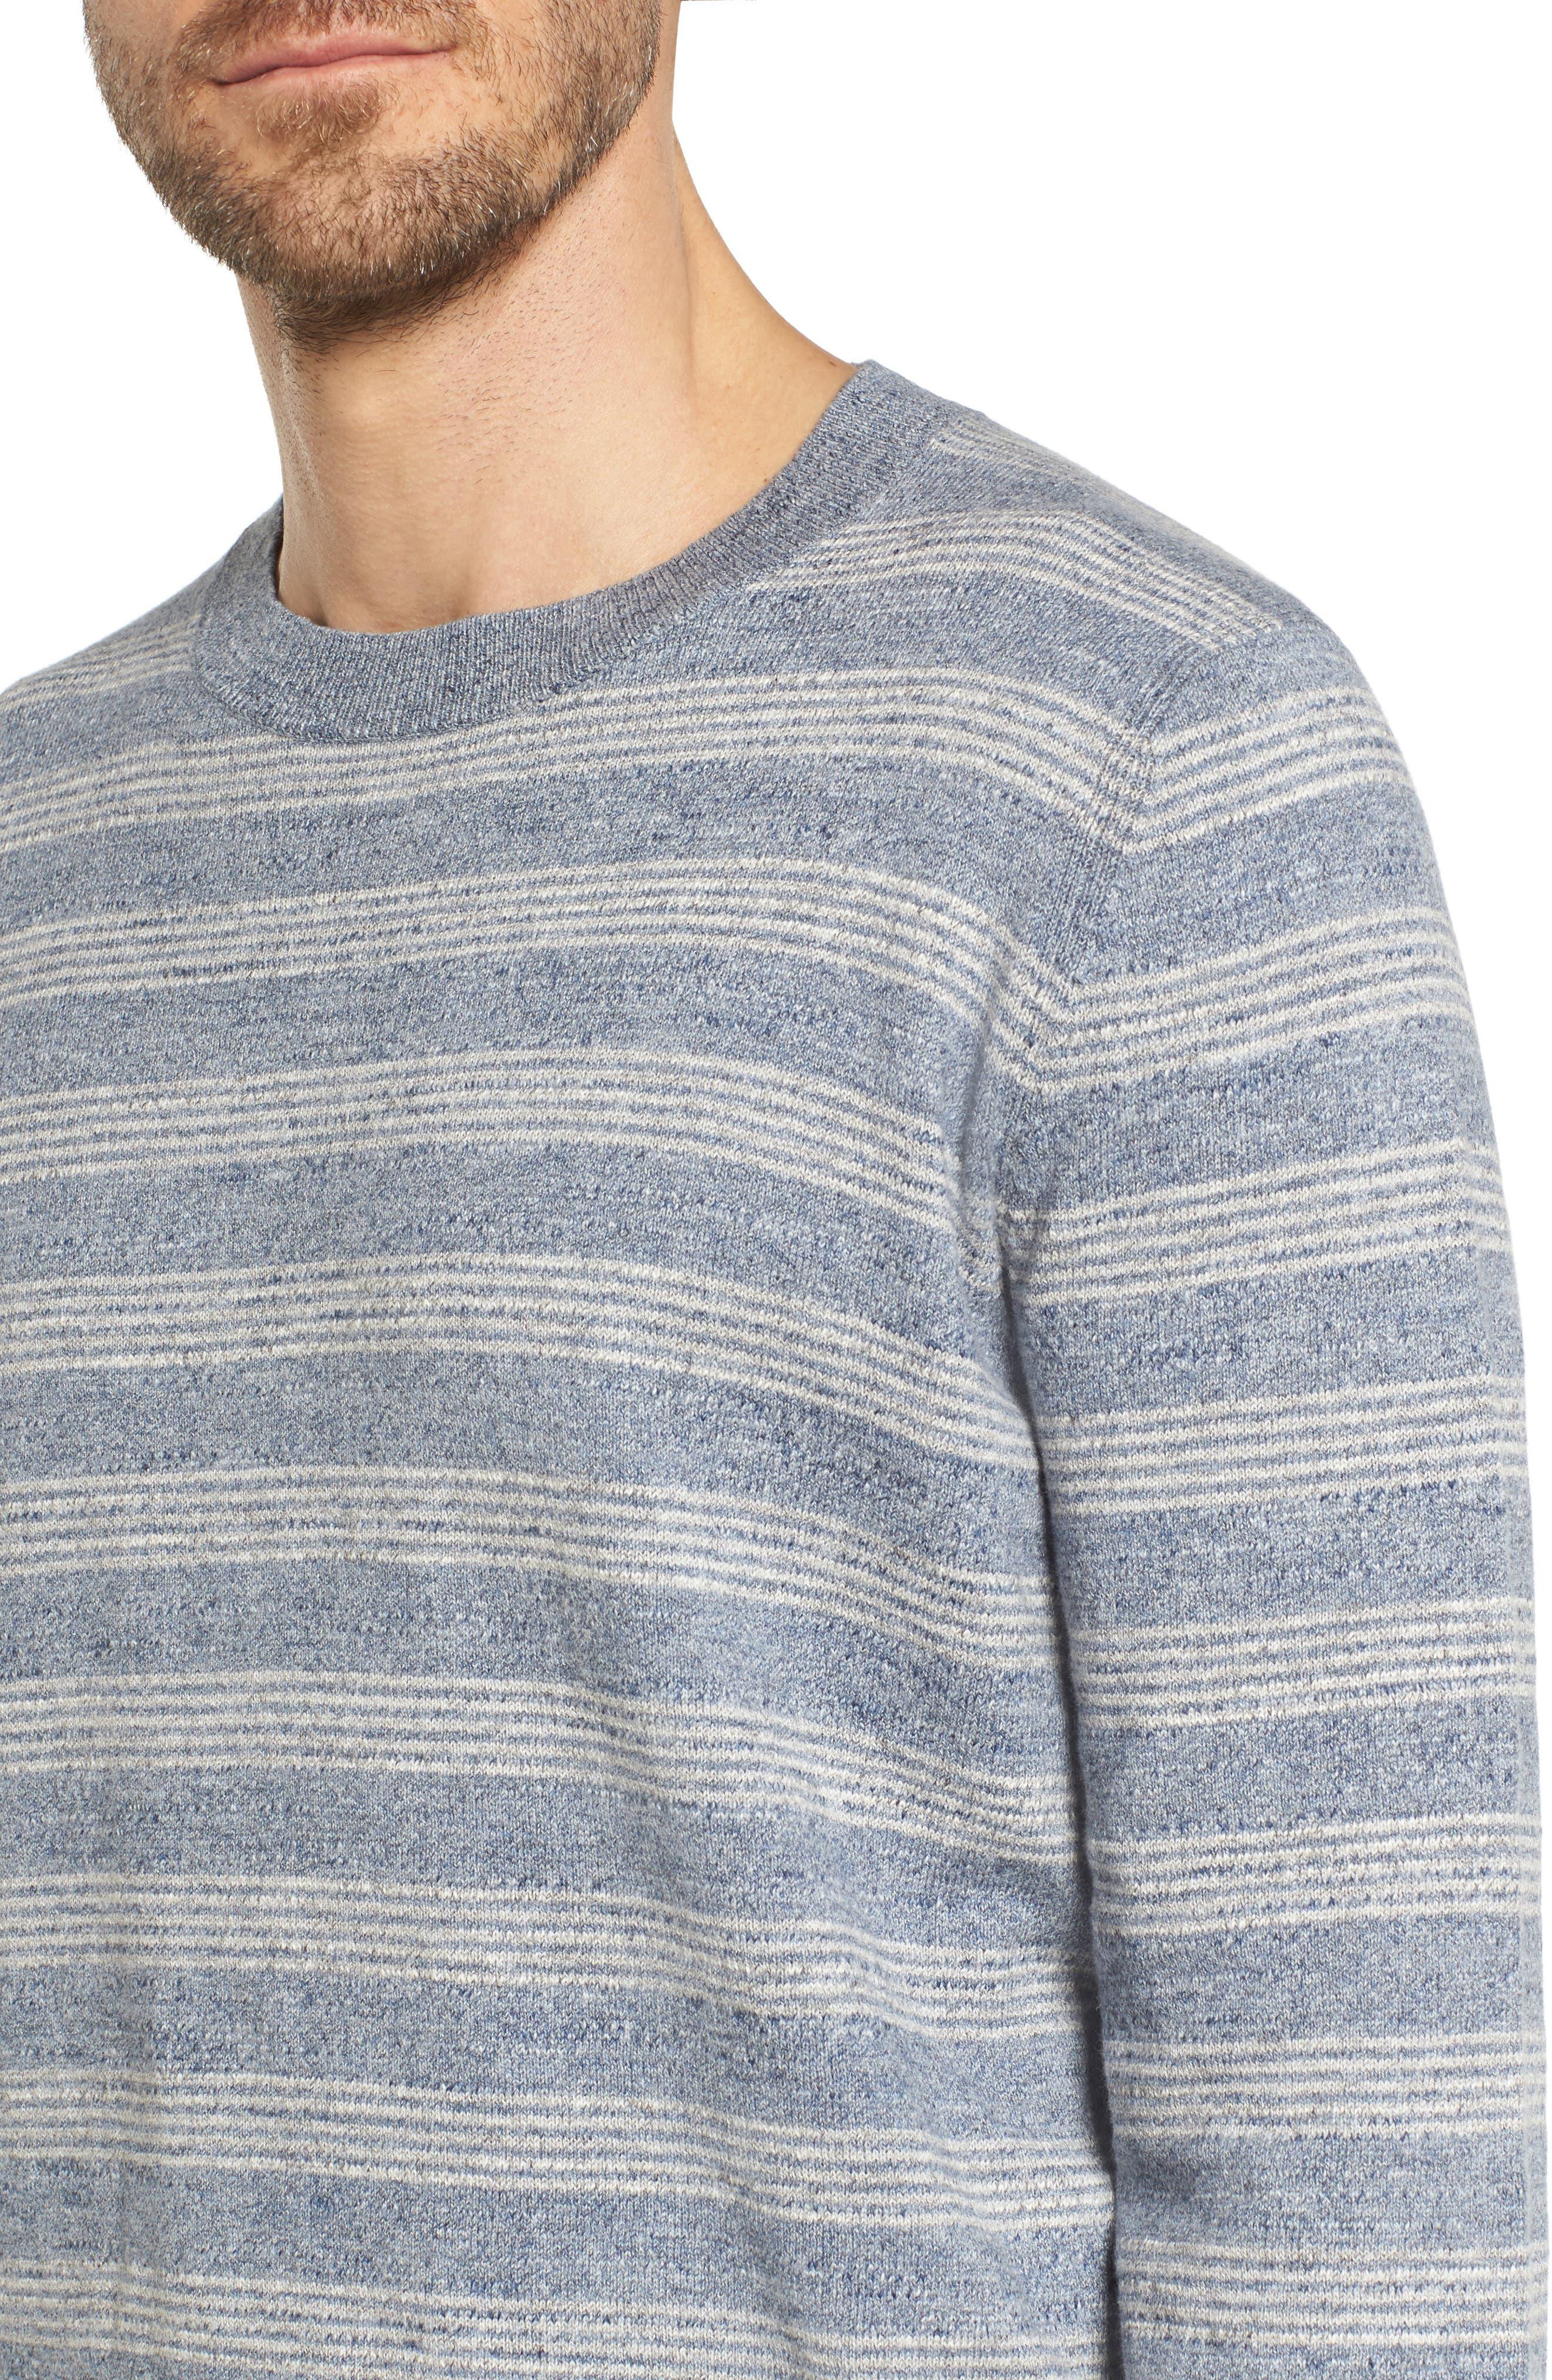 Stripe Cotton Sweater,                             Alternate thumbnail 4, color,                             Blue Grey Heather Stripe